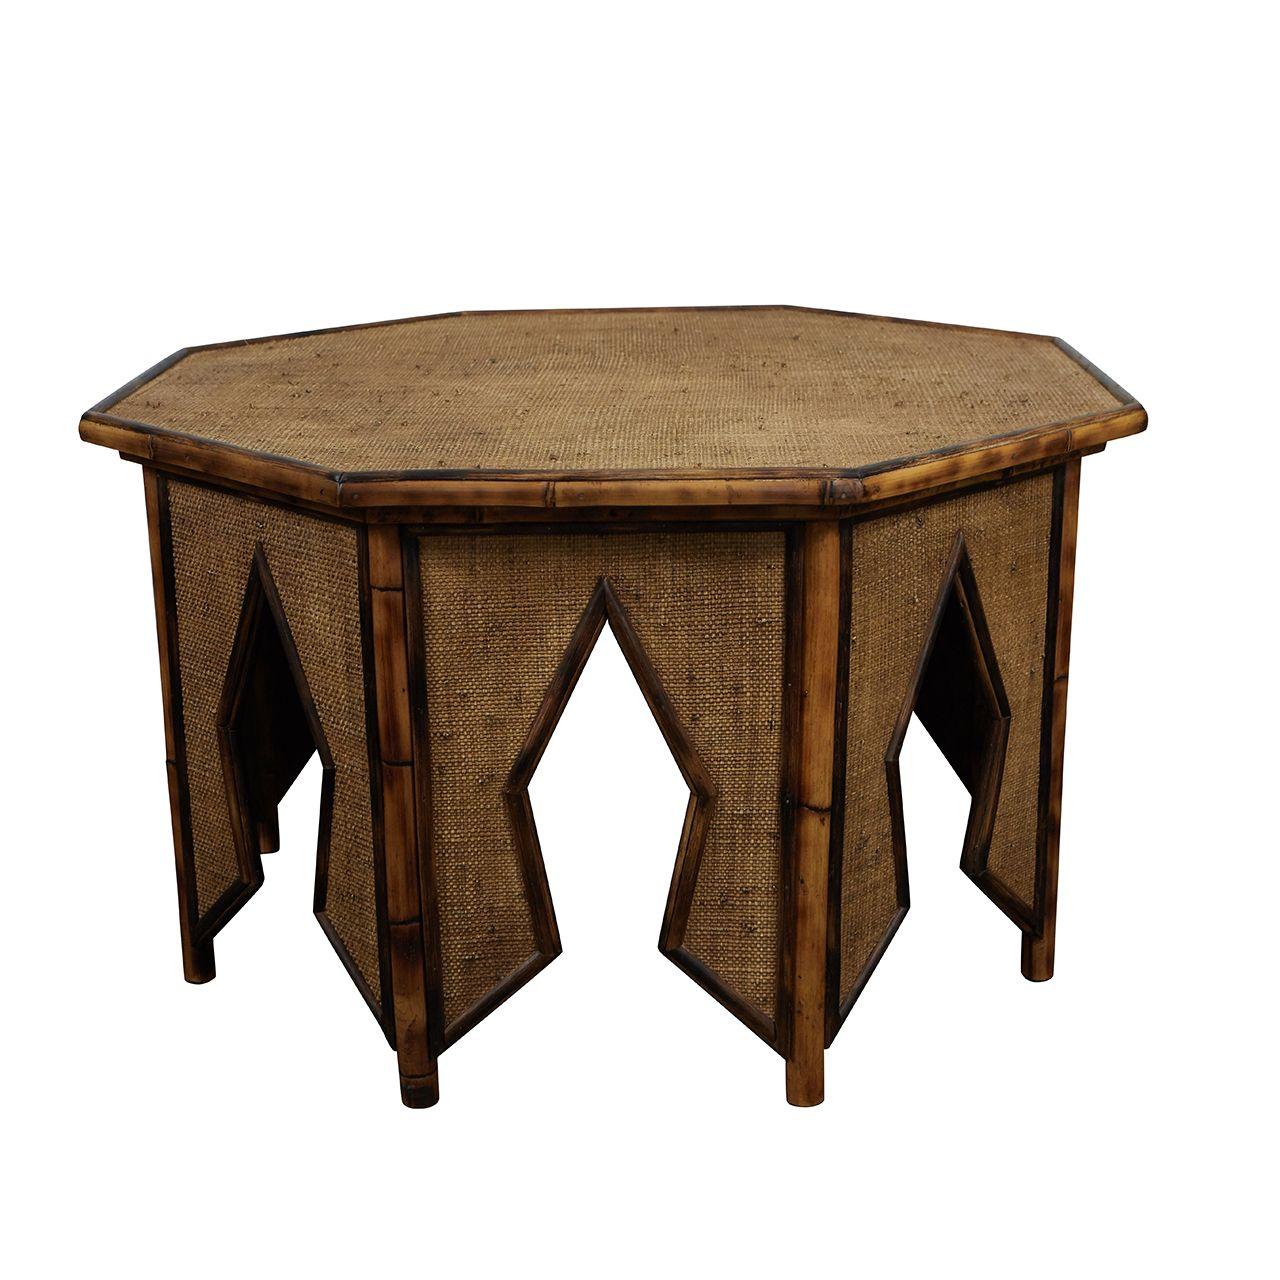 Jw Custom Line Tiger Bamboo Octagonal Coffee Table Jefferson West Inc Octagonal Coffee Table Bamboo Coffee Table Coffee Table [ 1280 x 1280 Pixel ]